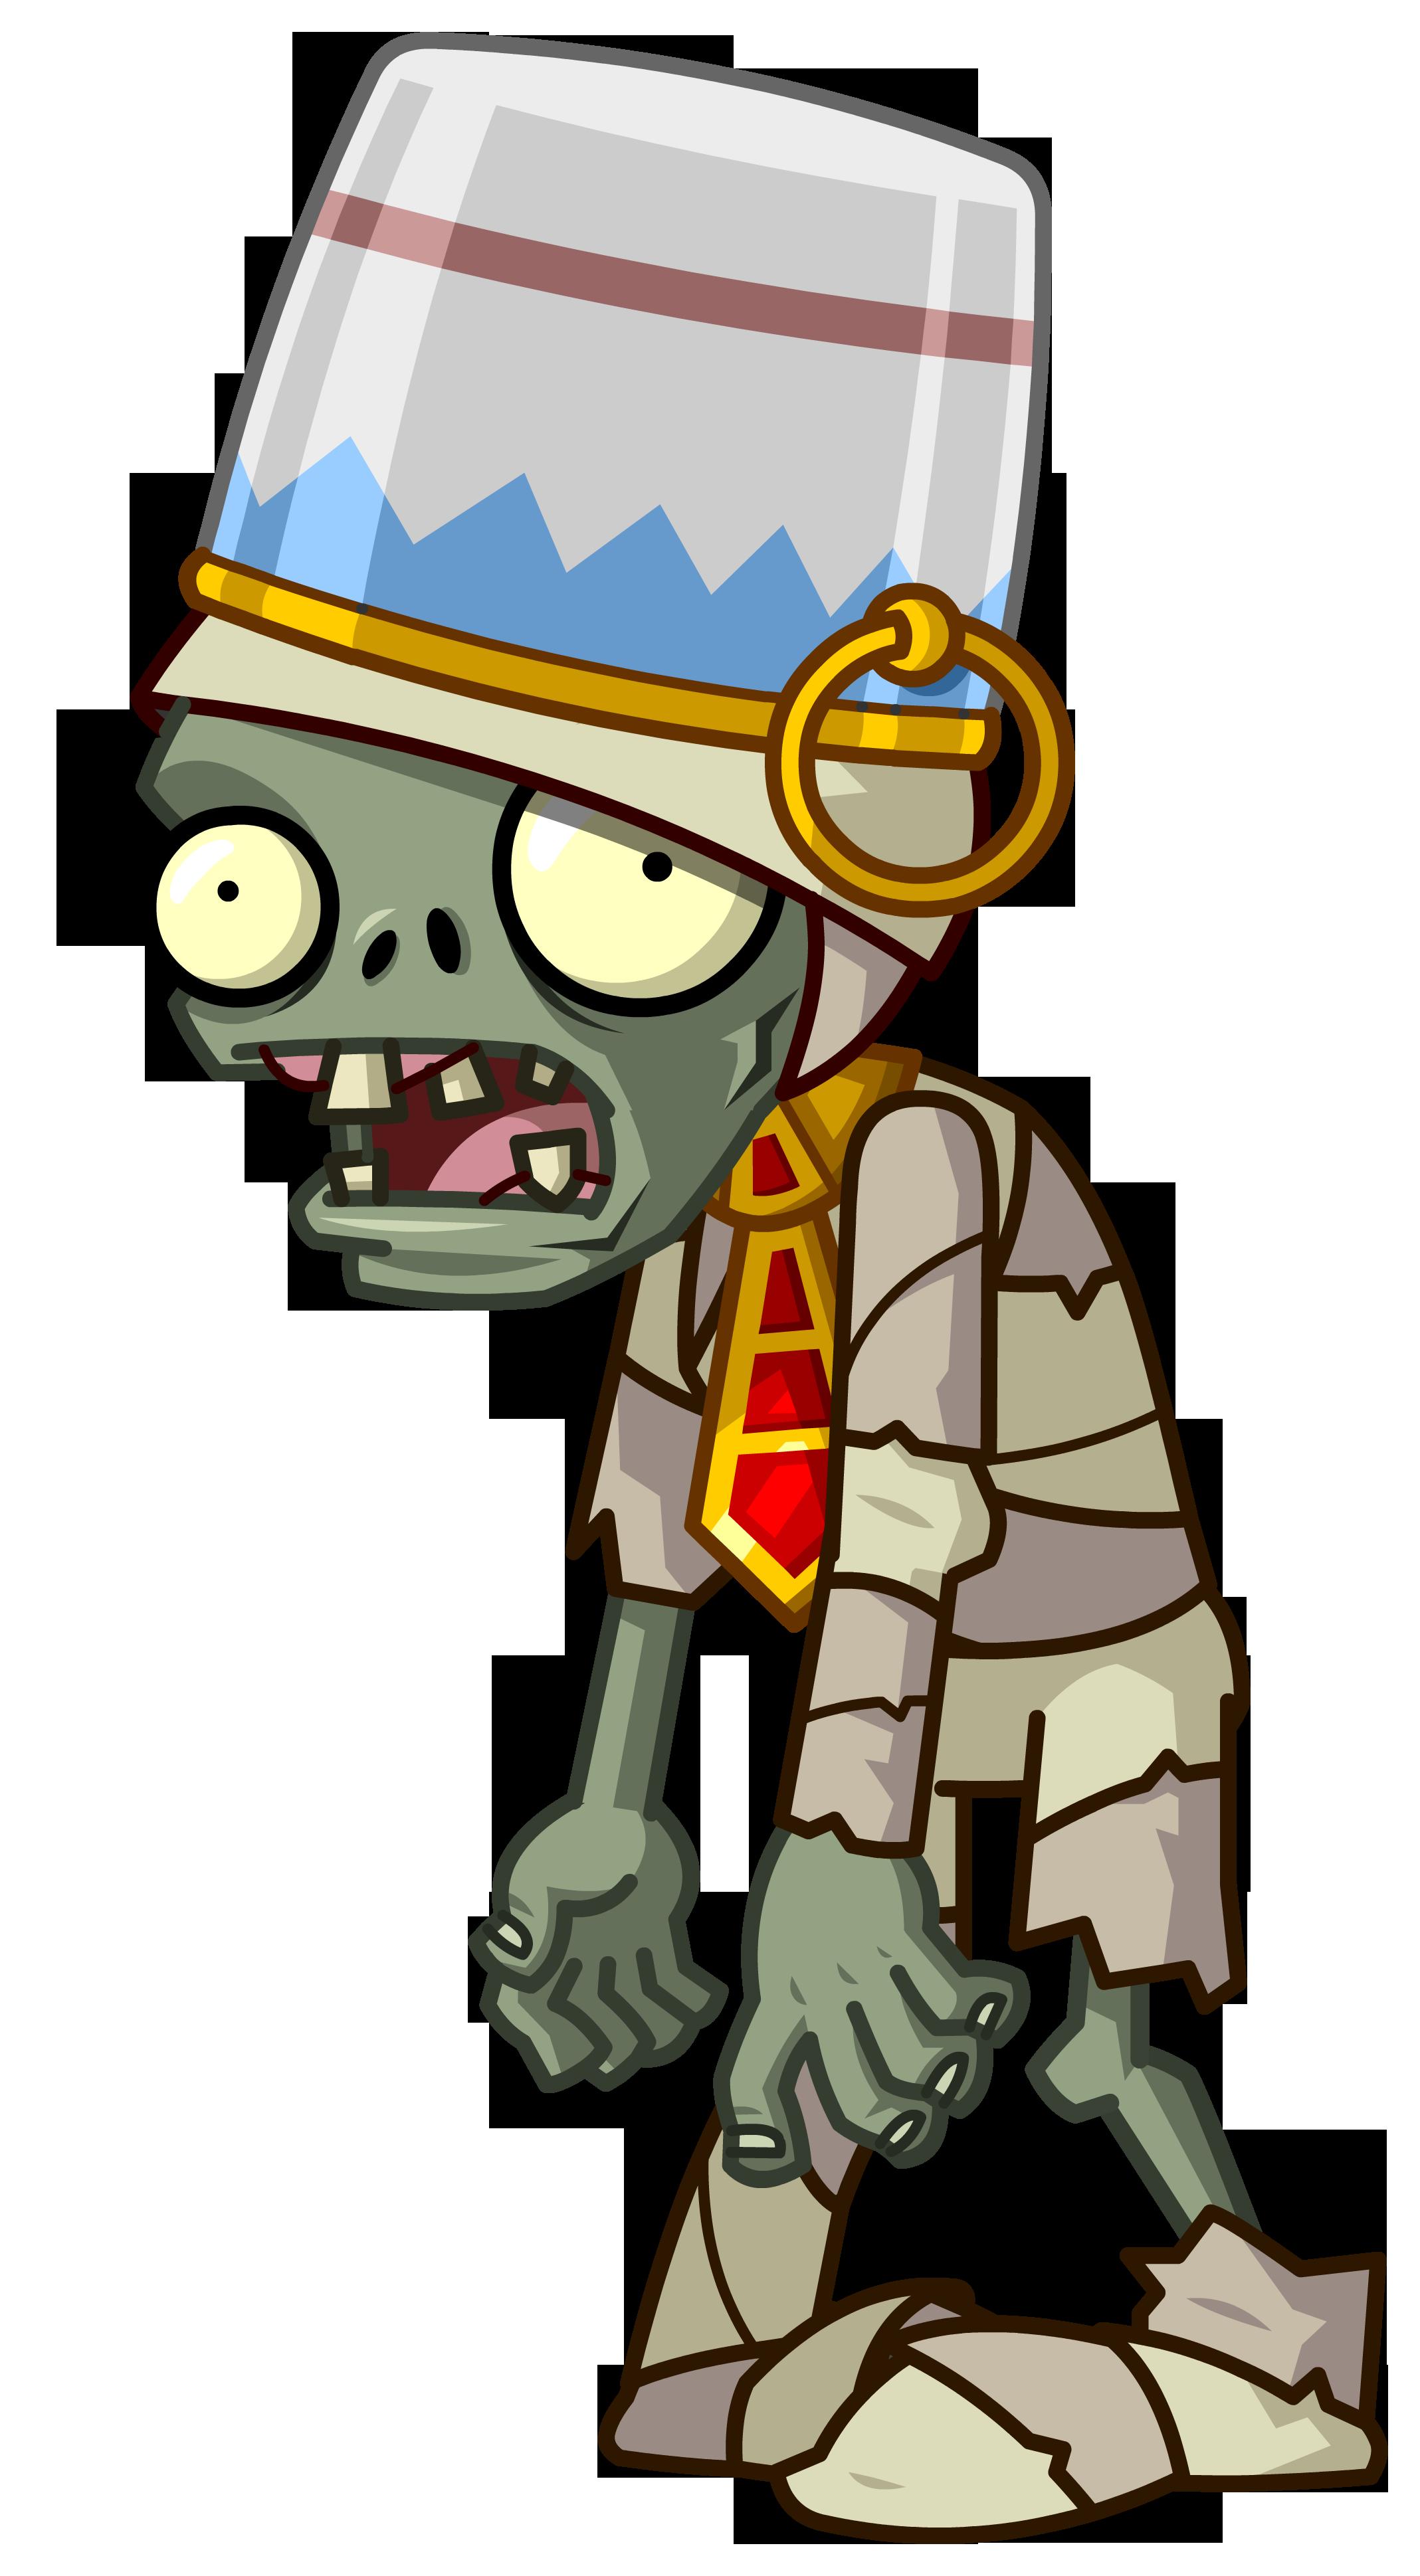 Rock star birthday boy clipart banner download zombi momiacaracubo | zombi | Pinterest | Plants vs zombies, Zombie ... banner download